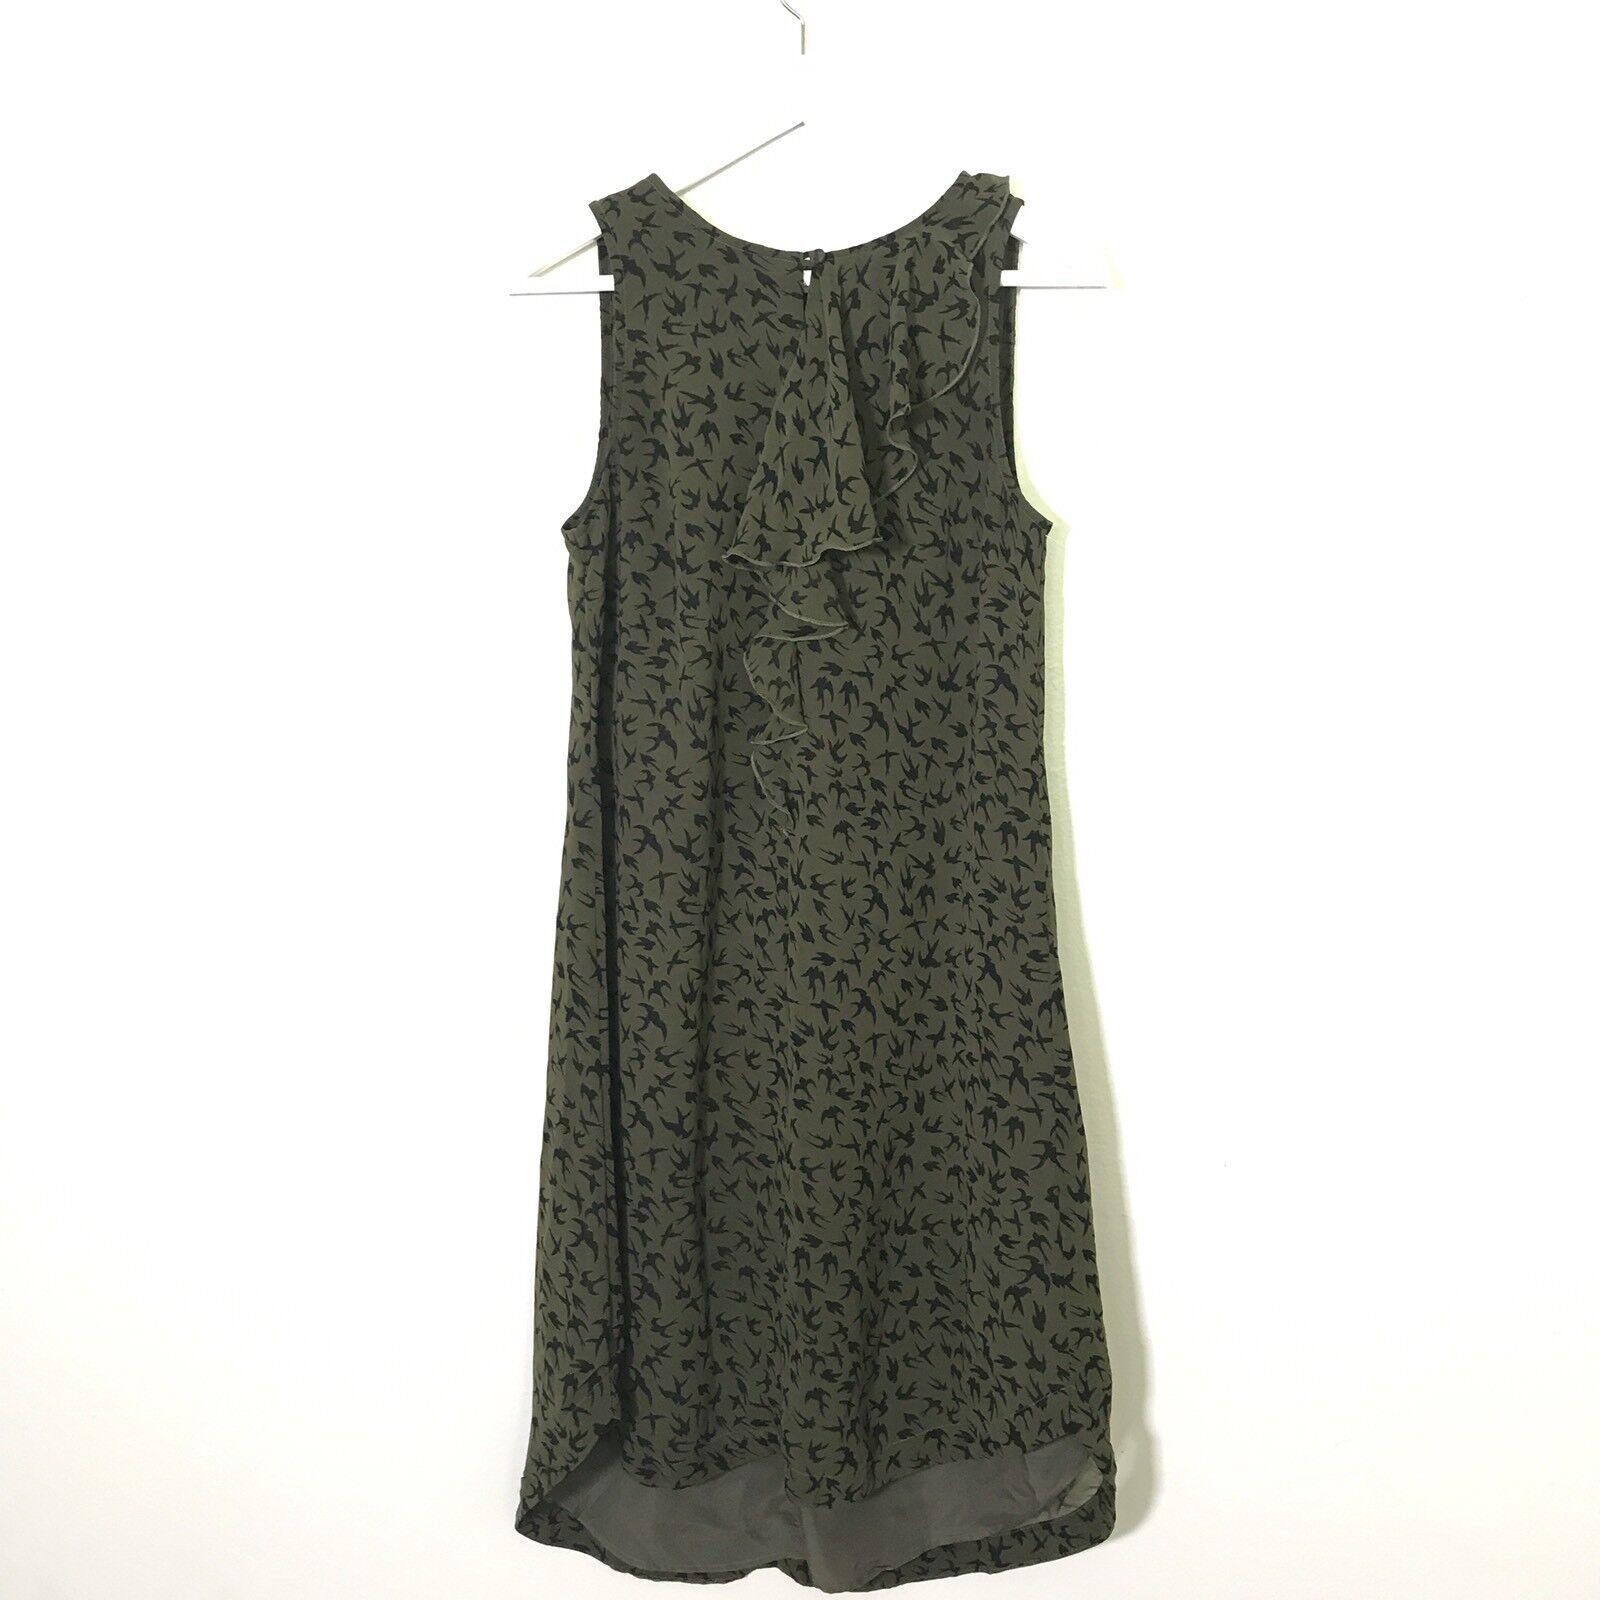 db7276a8fed Eshakti S Sleevless Print Ruffle Green Shift Swing Hi-Low Dress Olive Bird  oapopl1530-Dresses